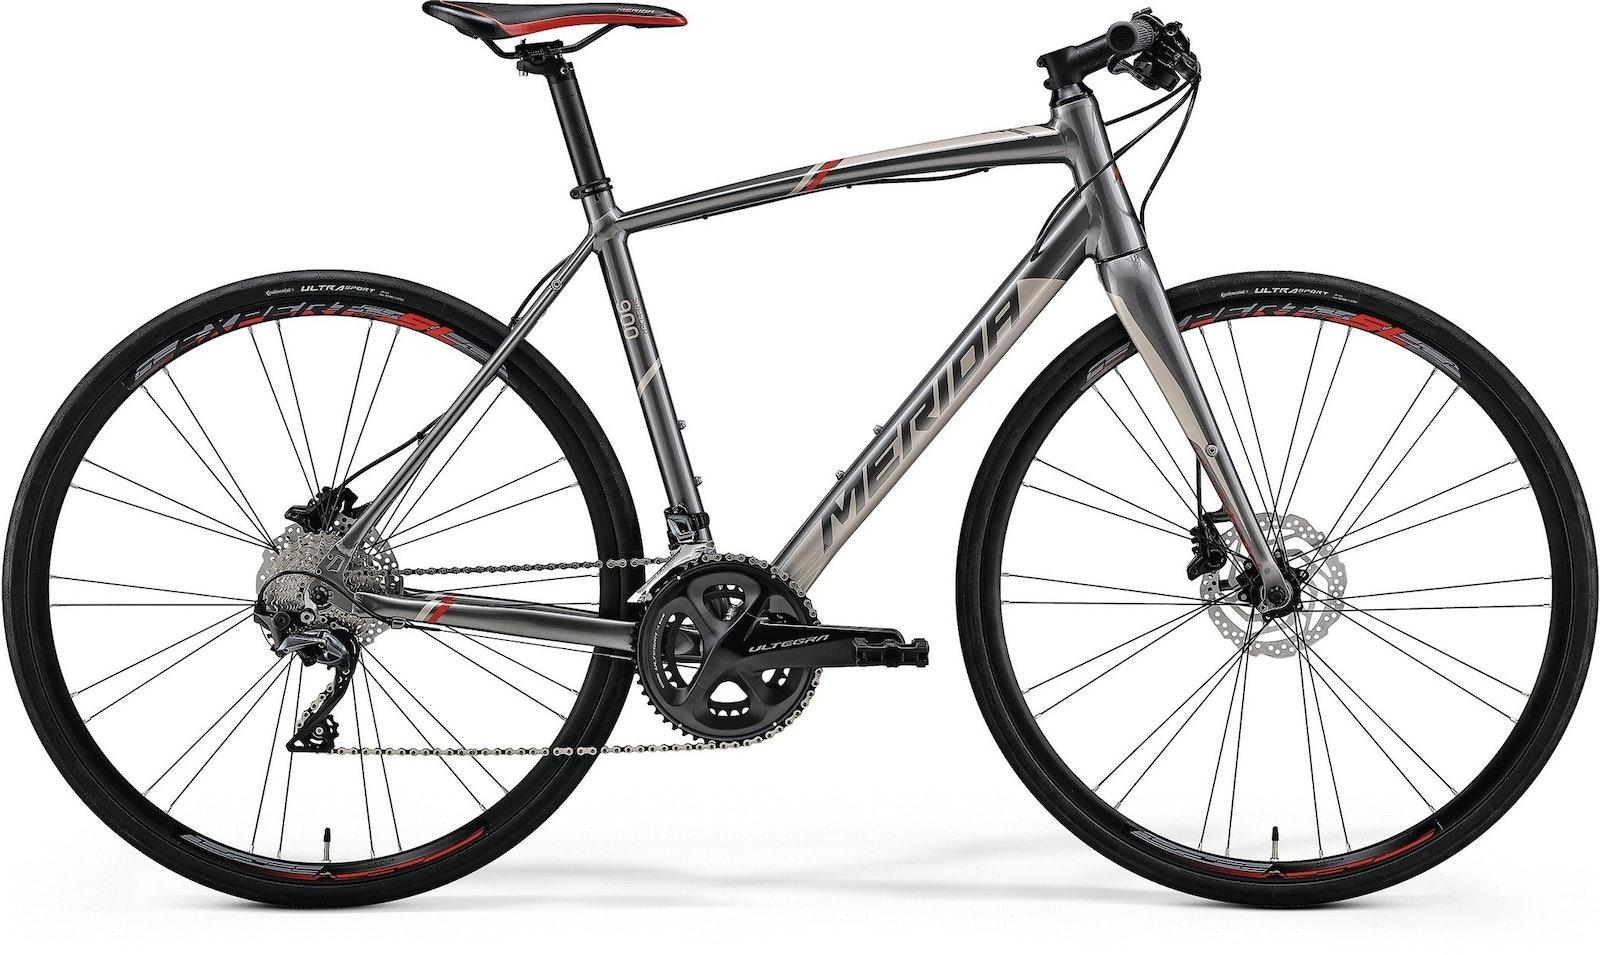 Merida Speeder 900 2018 Flat Bar Road Bikes For Sale In